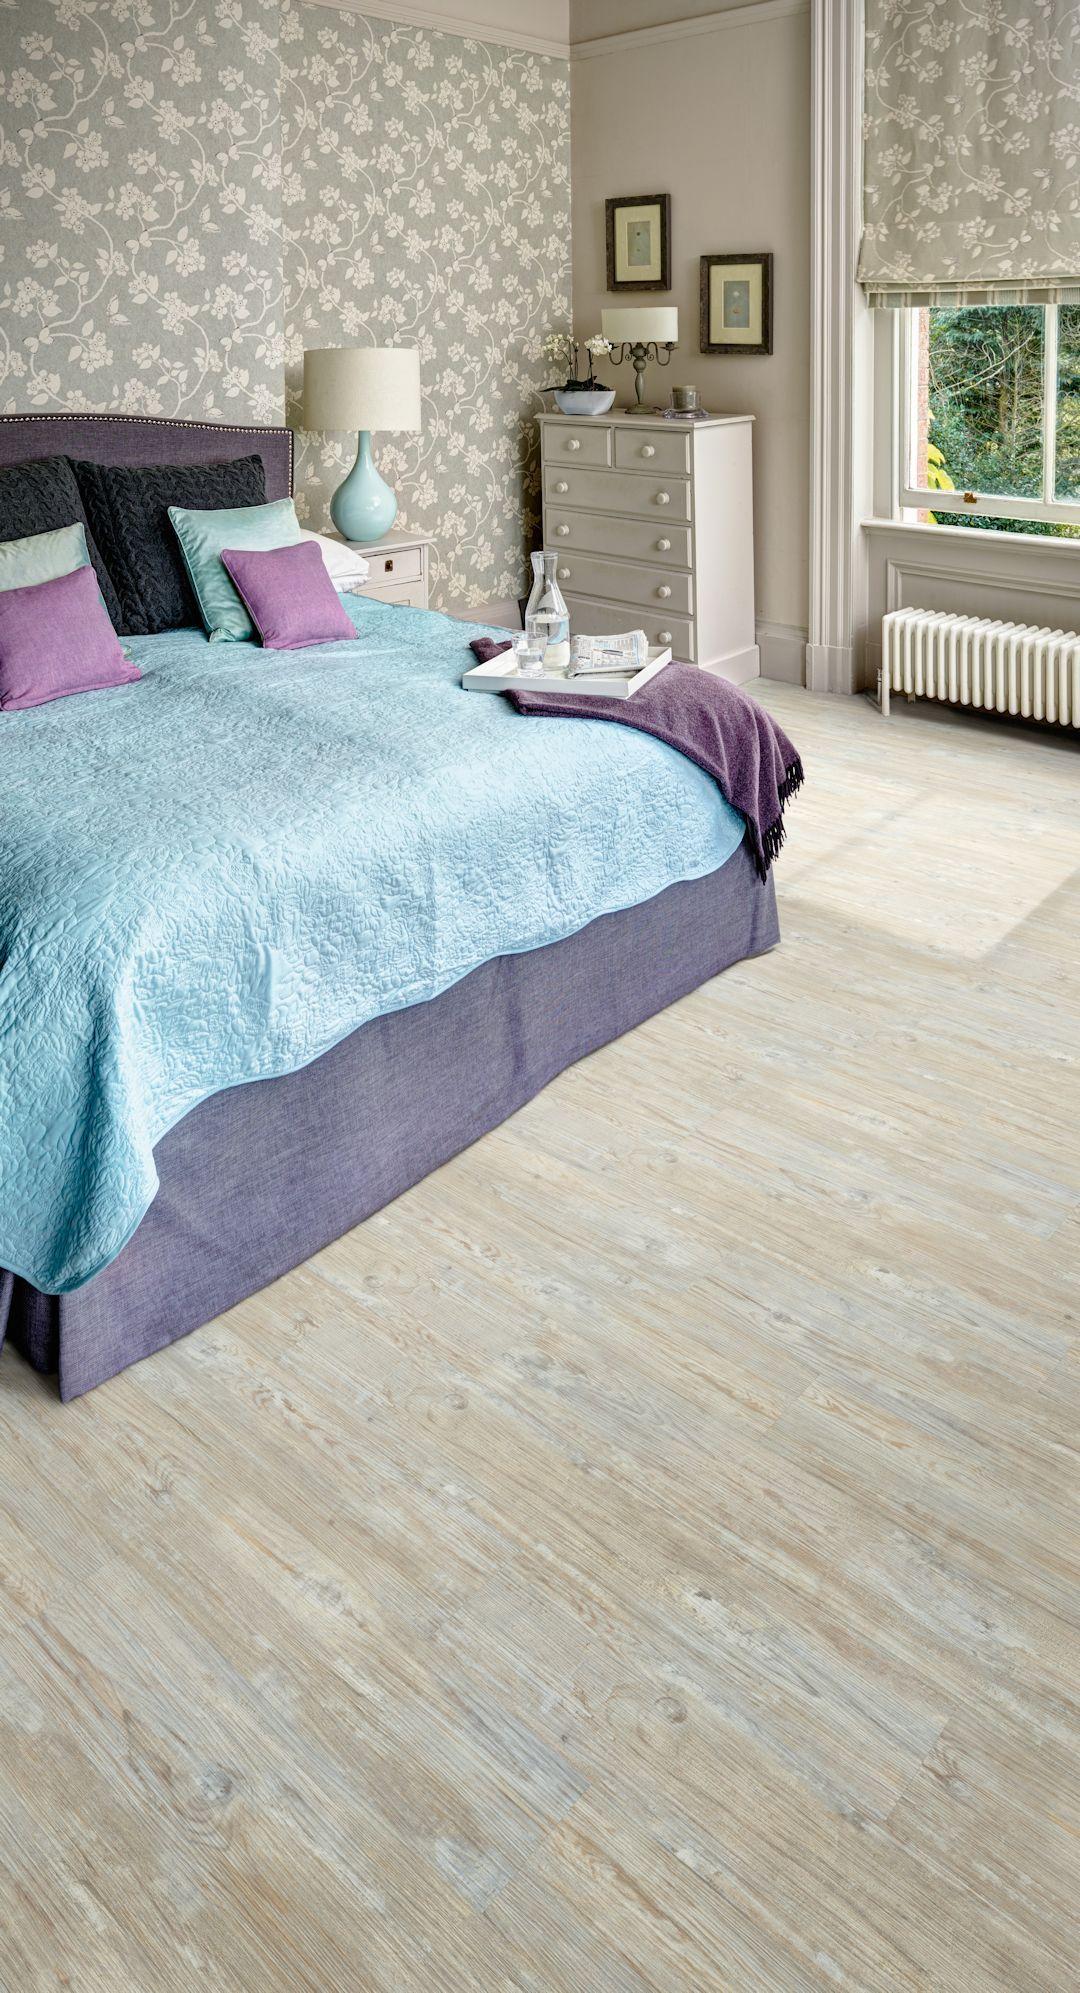 White Limed Oak Camaro luxury vinyl tile flooring featured